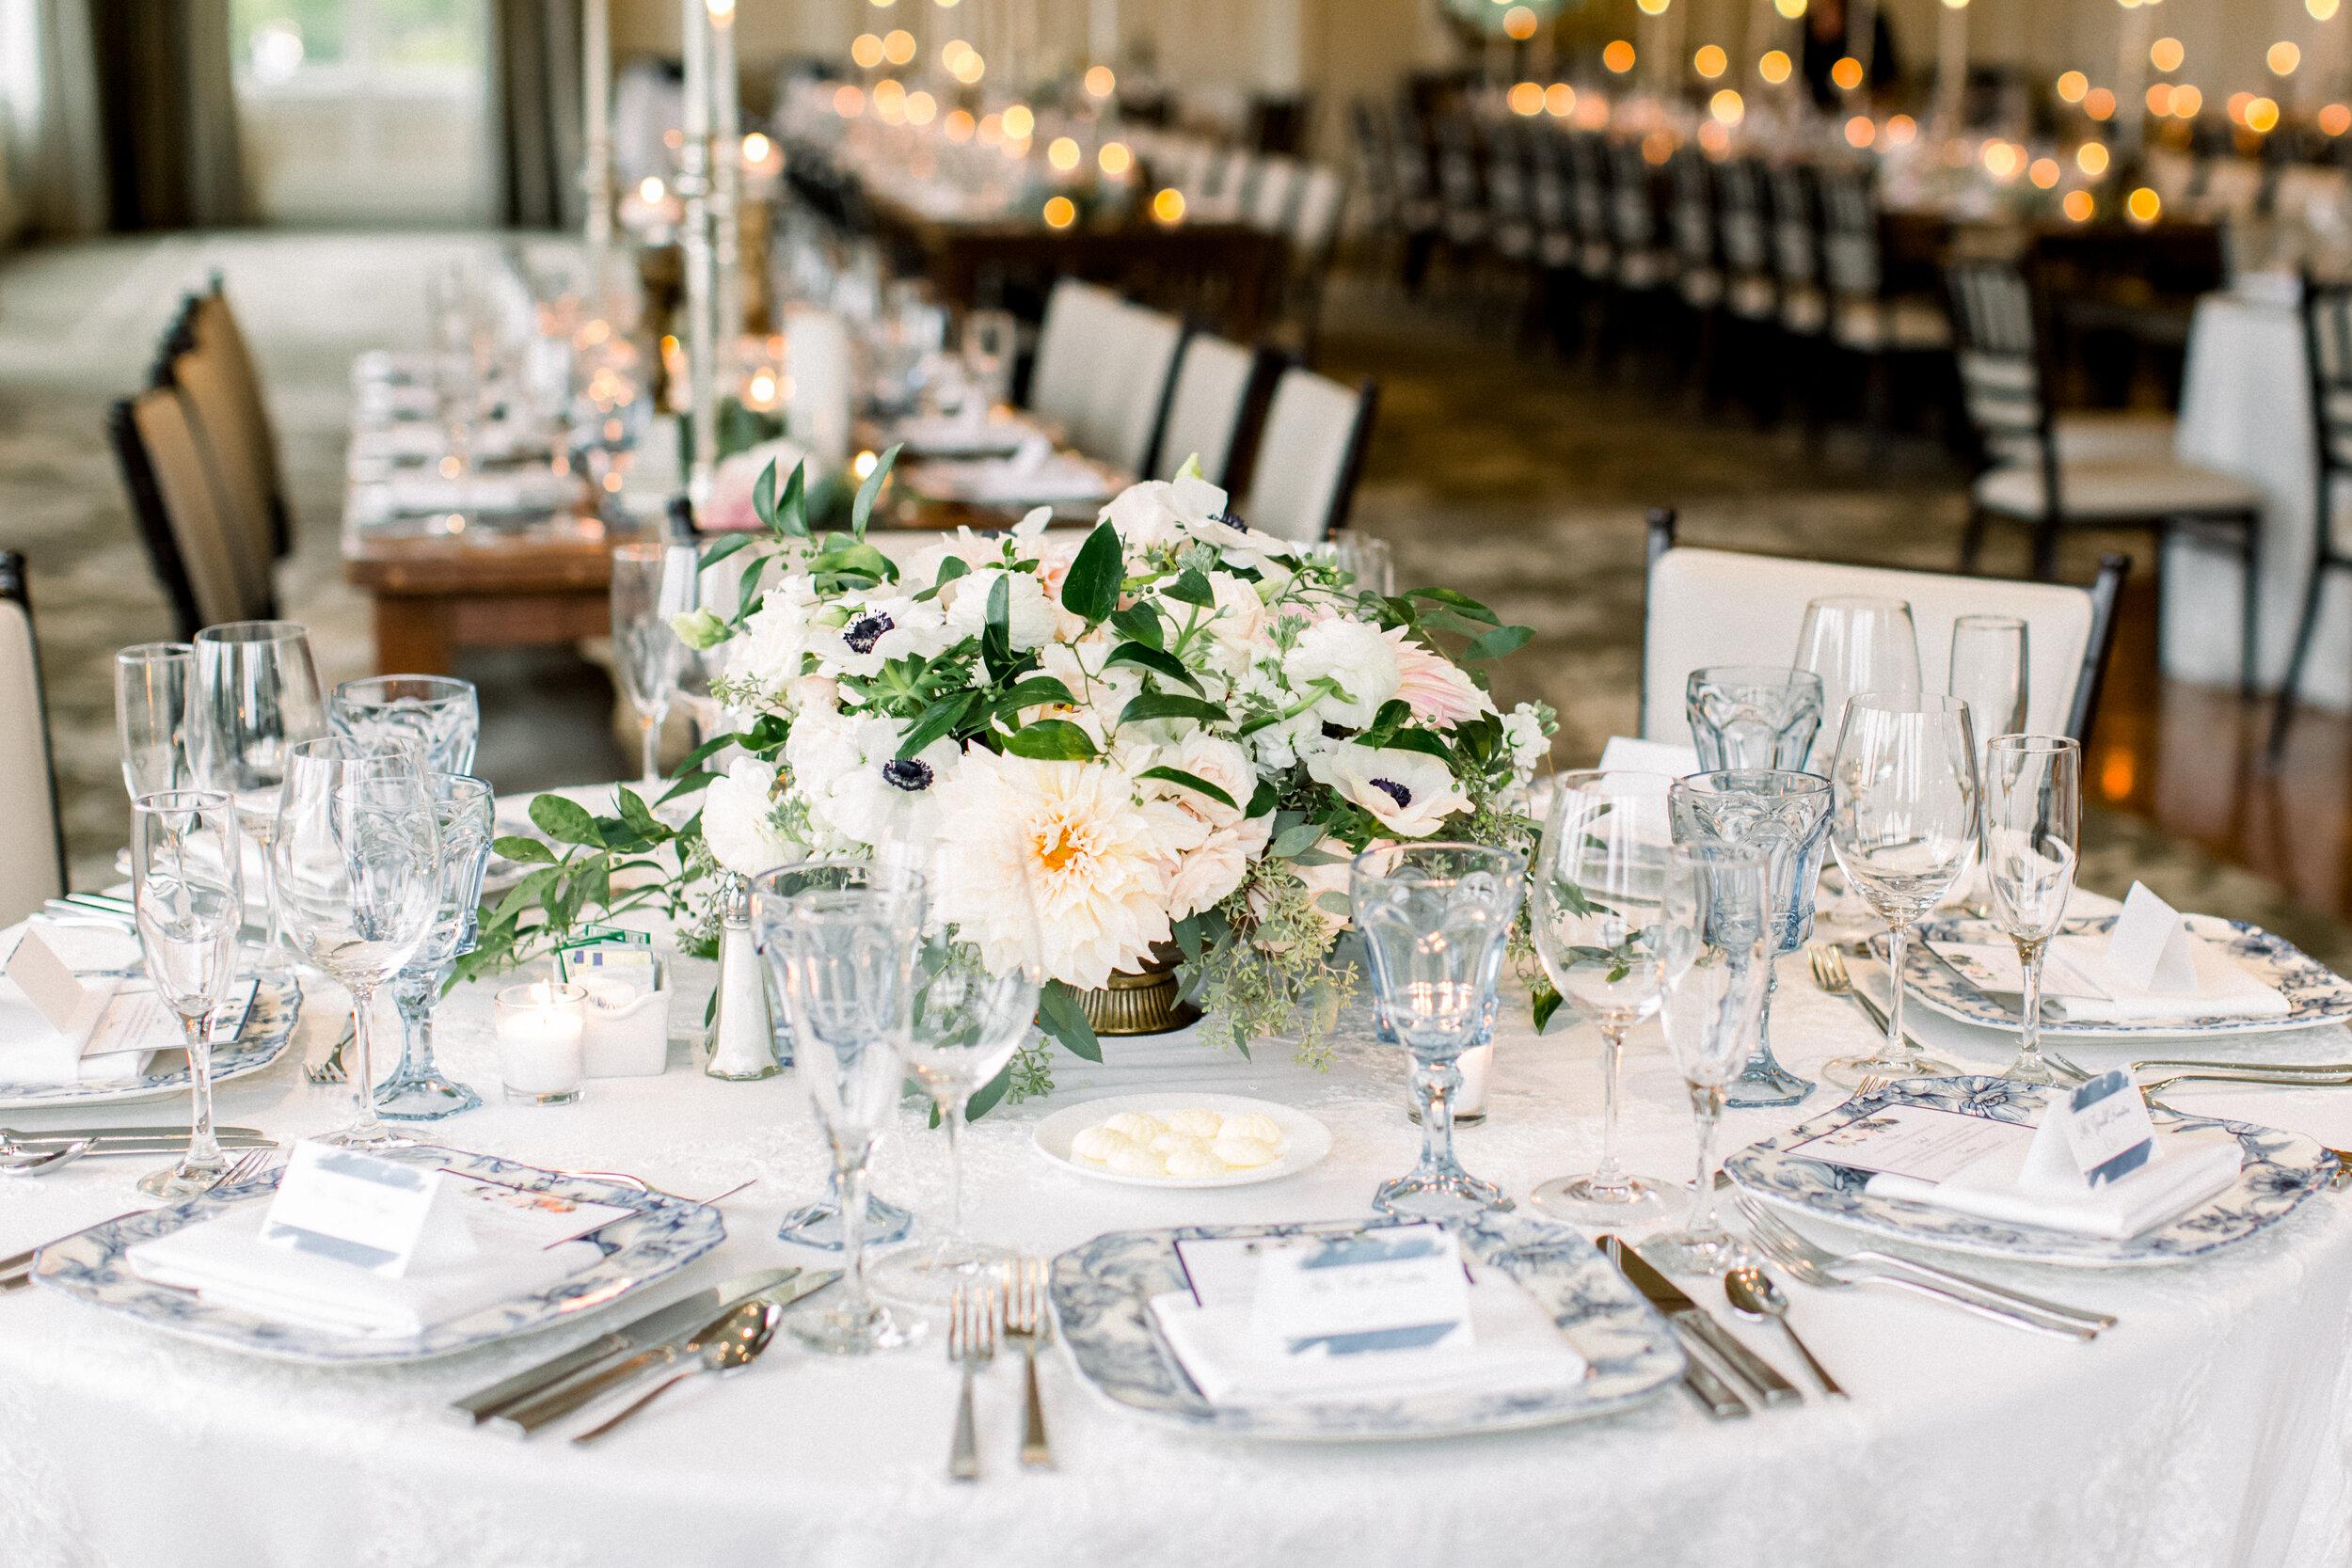 Kuiper+Wedding+Reception+Details-56.jpg